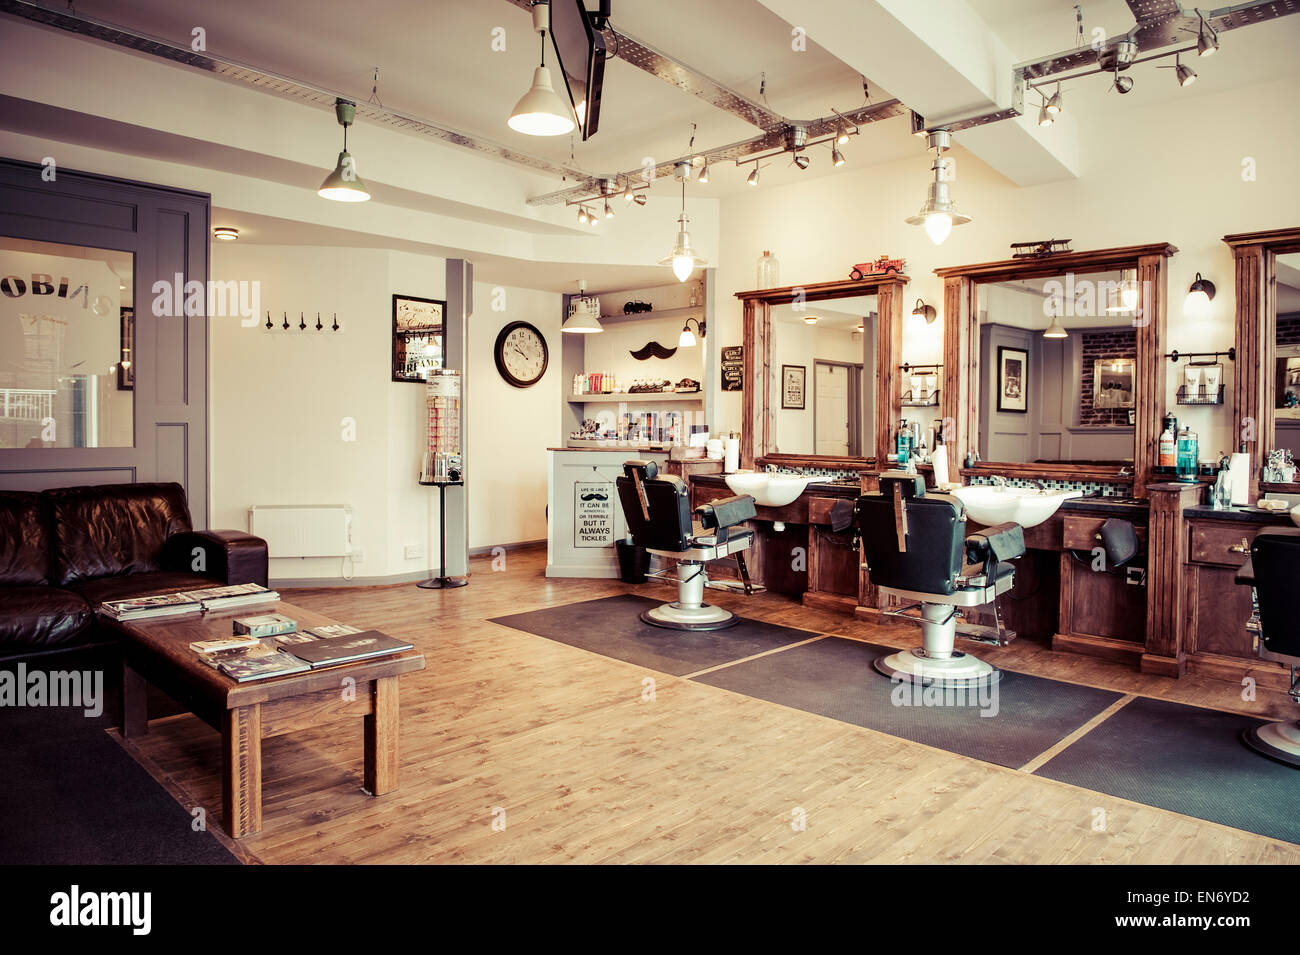 men's barber shop retro styled interior design stock photo  - men's barber shop retro styled interior design